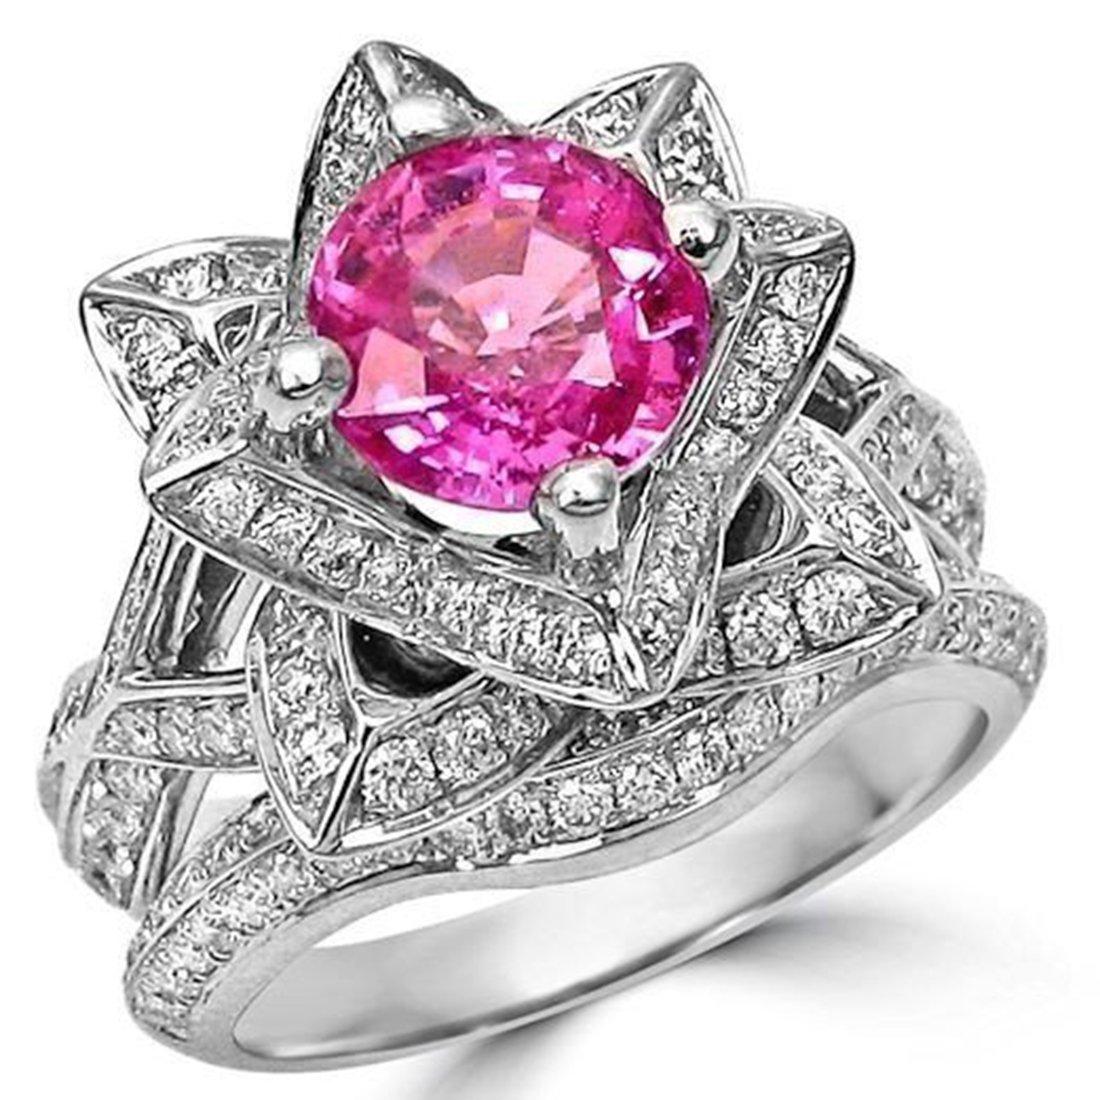 Smjewels 2.37 Ct Round Pink Sapphire Lotus Flower CZ Diamond Ring Bridal Set 14K White Gold Fn